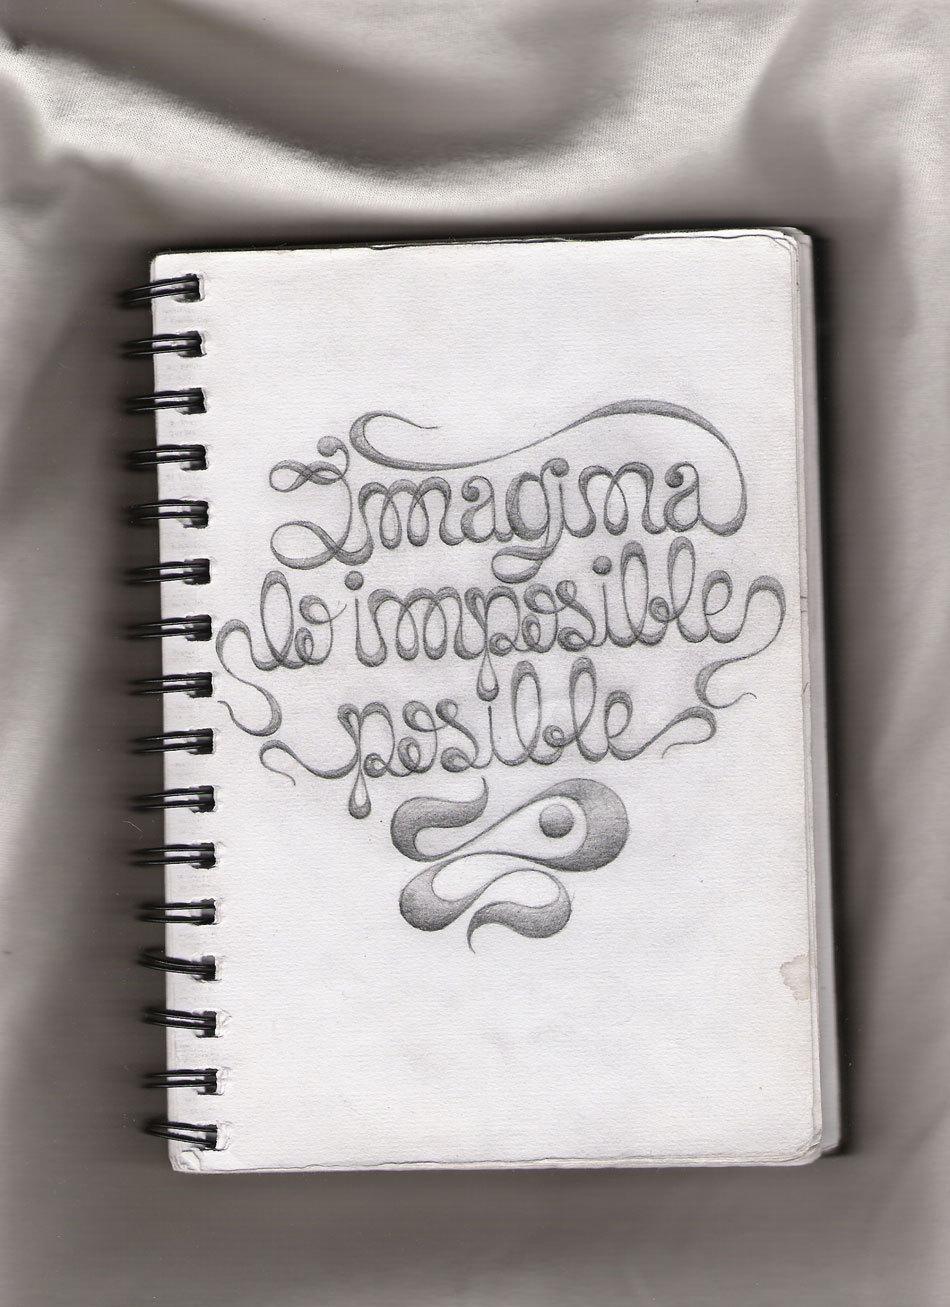 Mensaje Dibujos En Lapiz De Amor Www Miifotos Com